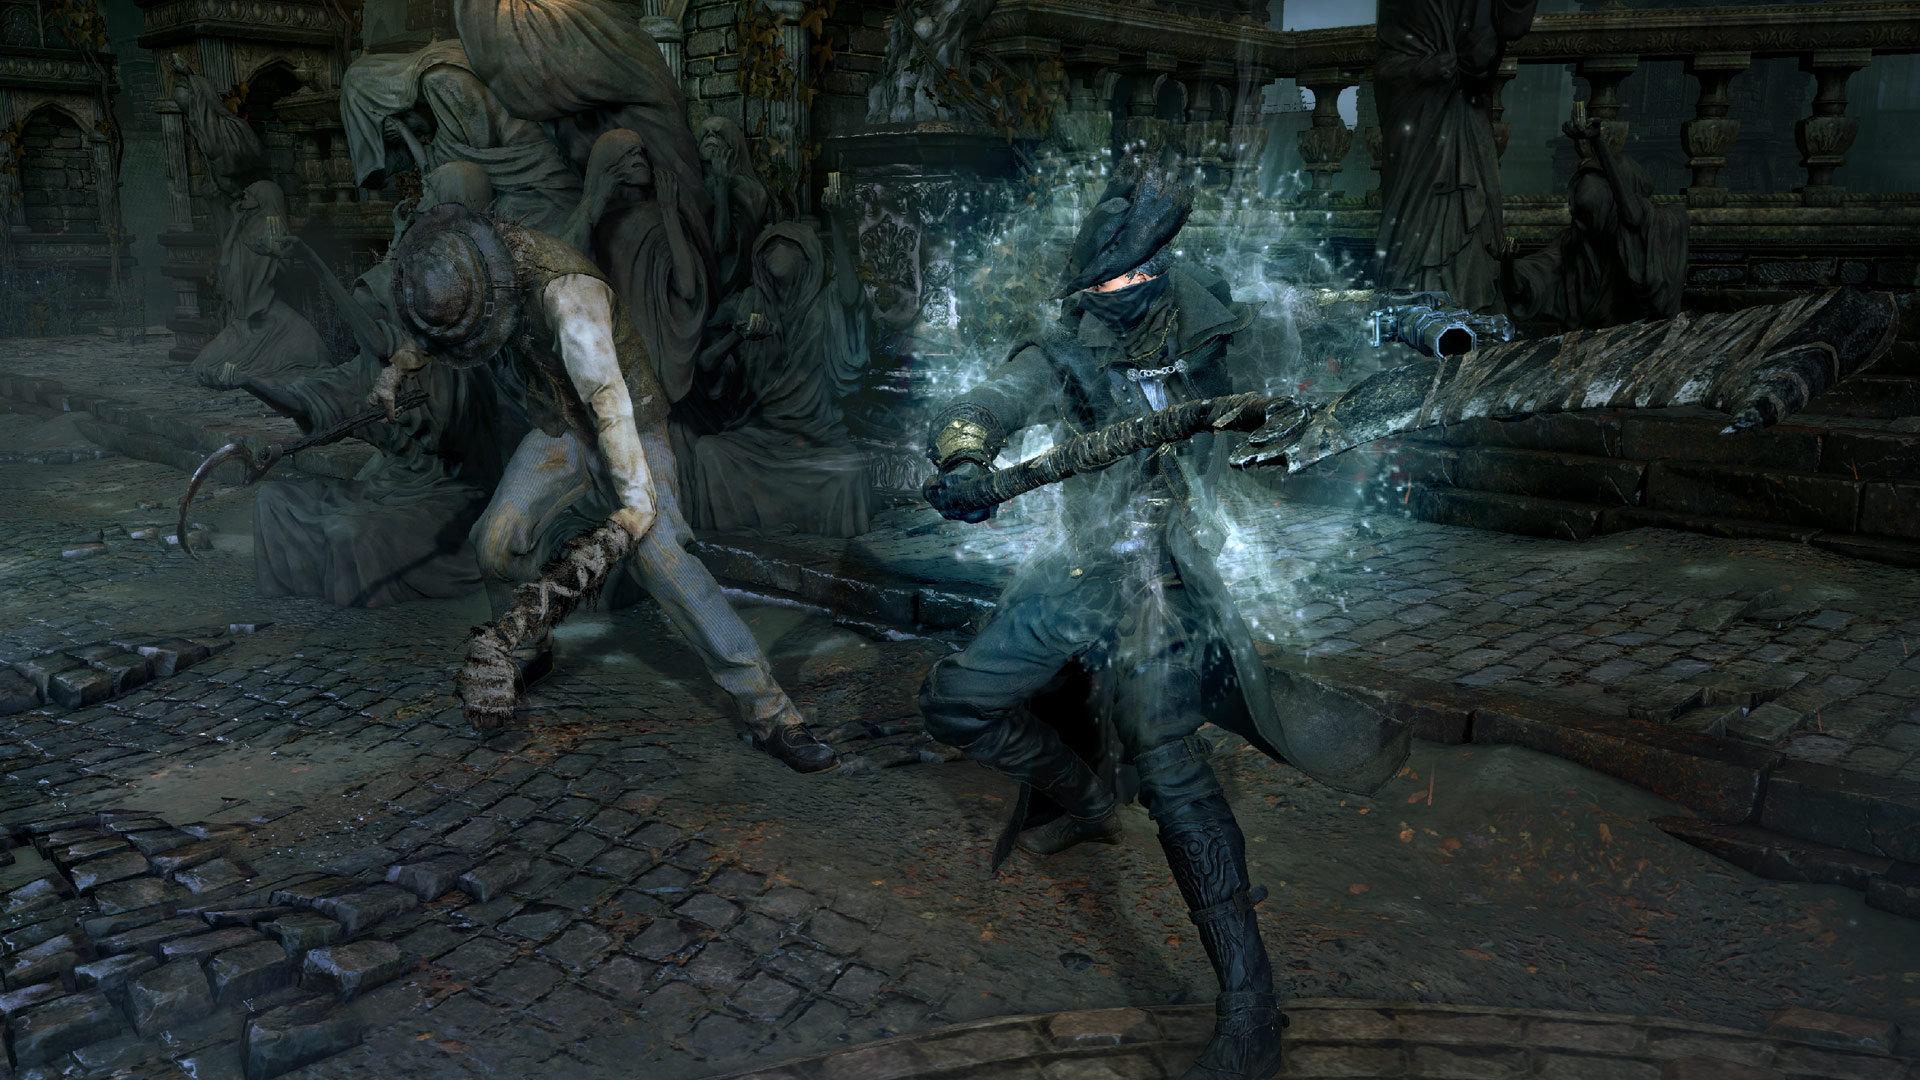 Bloodborne Includes Shields but Discourages Passive Battles